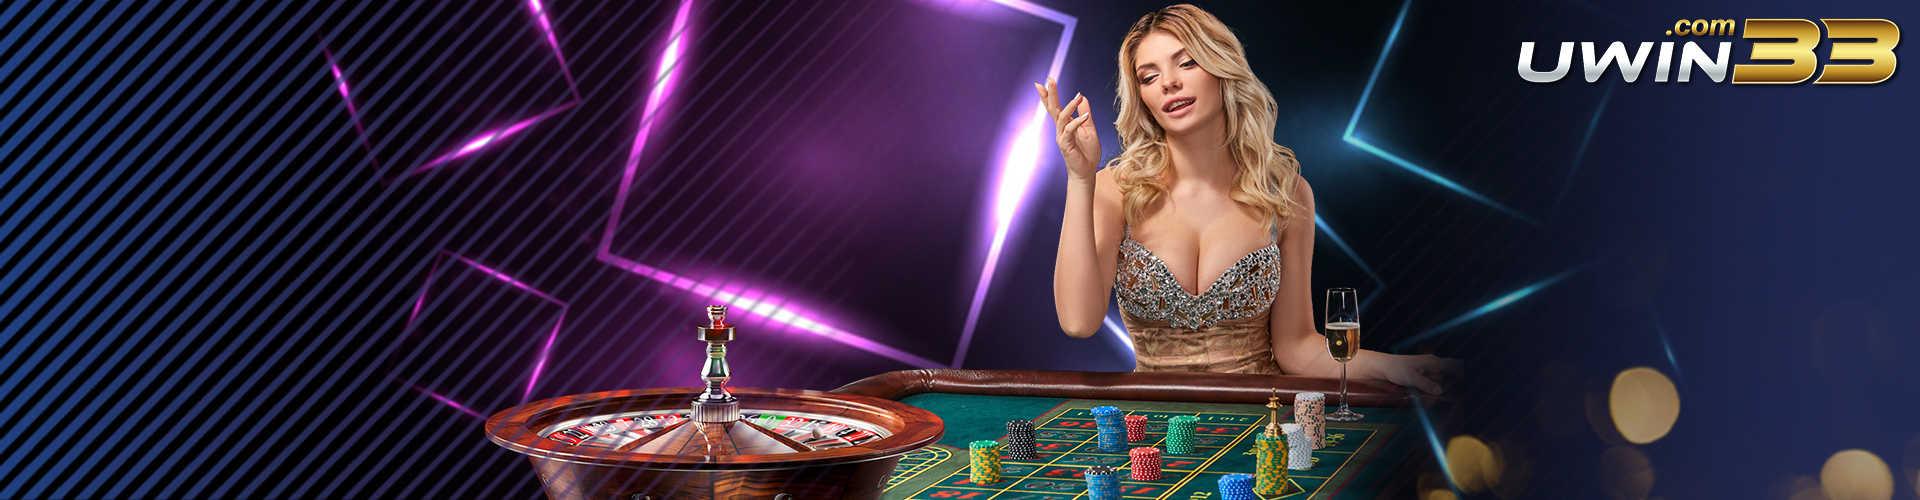 Fun Casino Games at UWin33